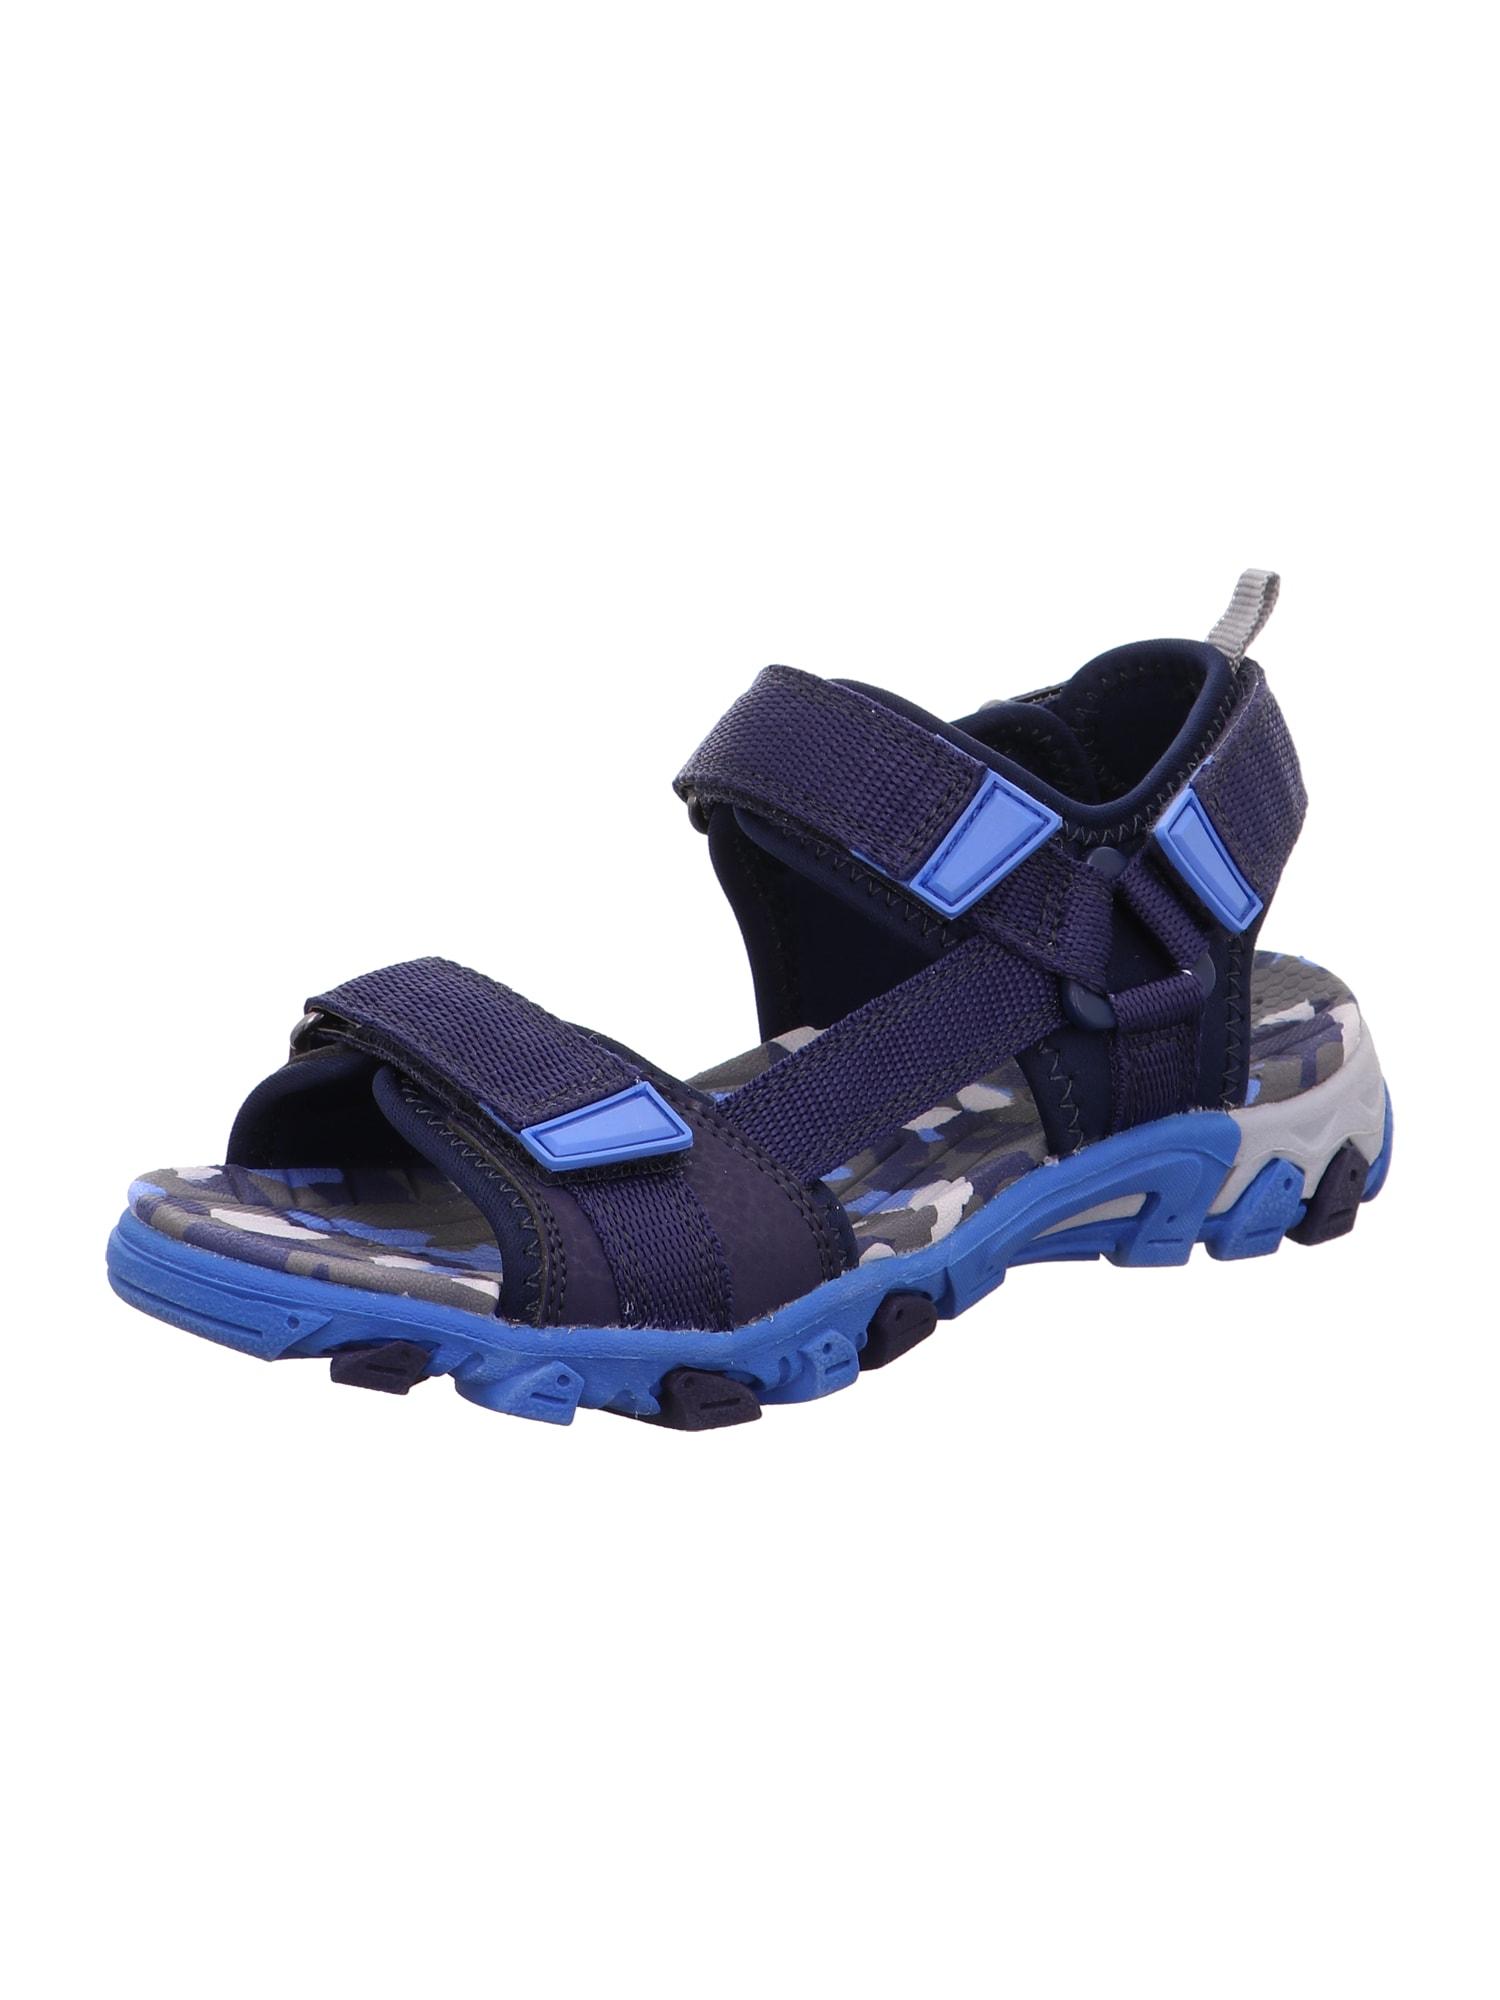 SUPERFIT Atviri batai mėlyna / tamsiai mėlyna